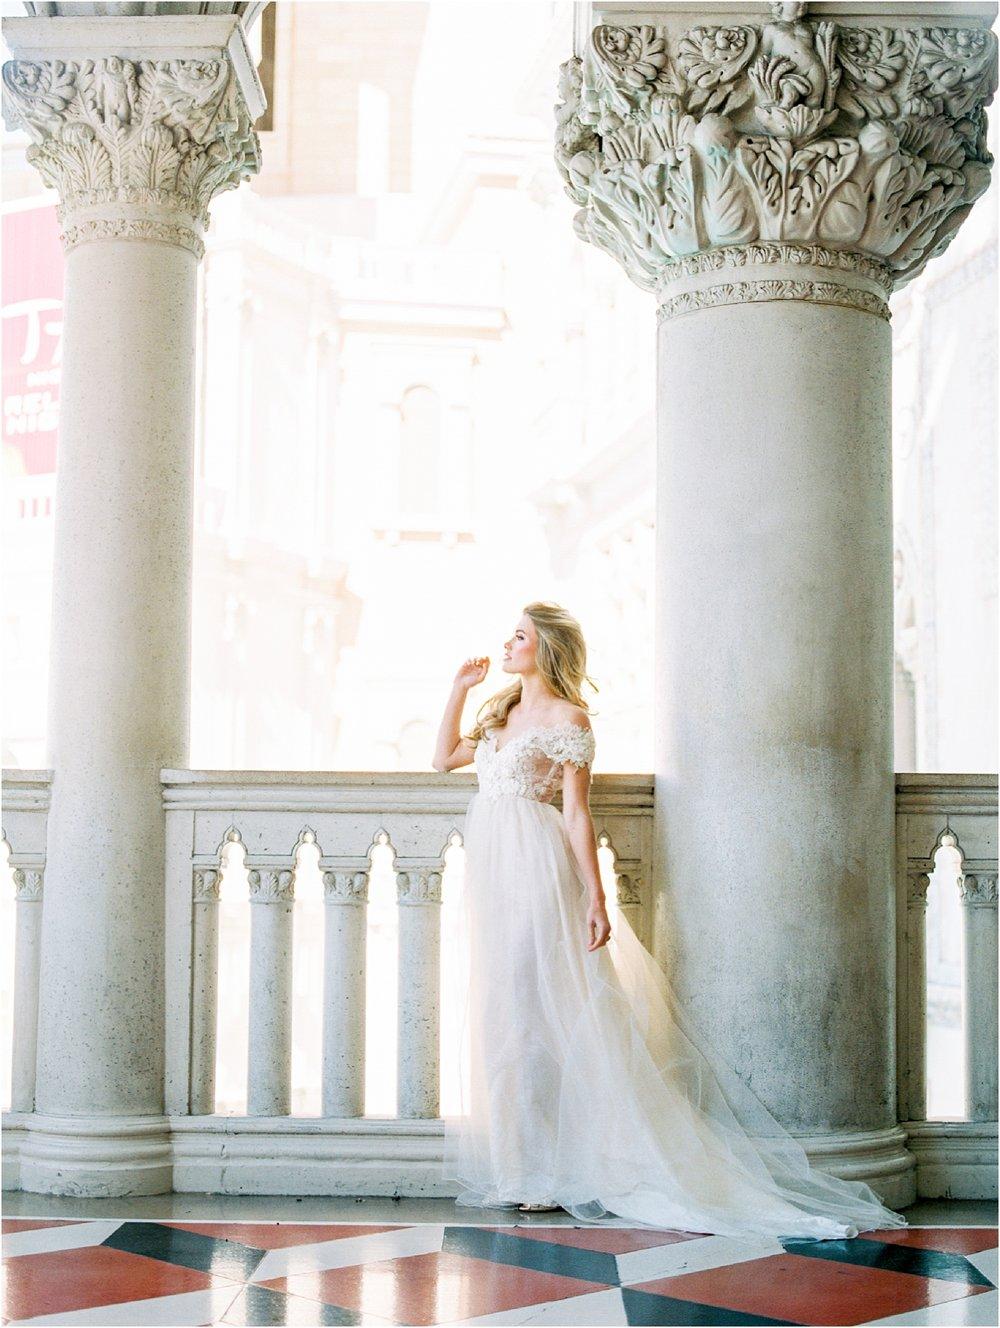 Lisa Silva Photography- Ponte Vedra Beach, St. Augustine and Jacksonville, Florida Fine Art Film Wedding and Boudoir Photography- Fine Art Film Bridal Editorial at the Venitian, Las Vegas_0018.jpg